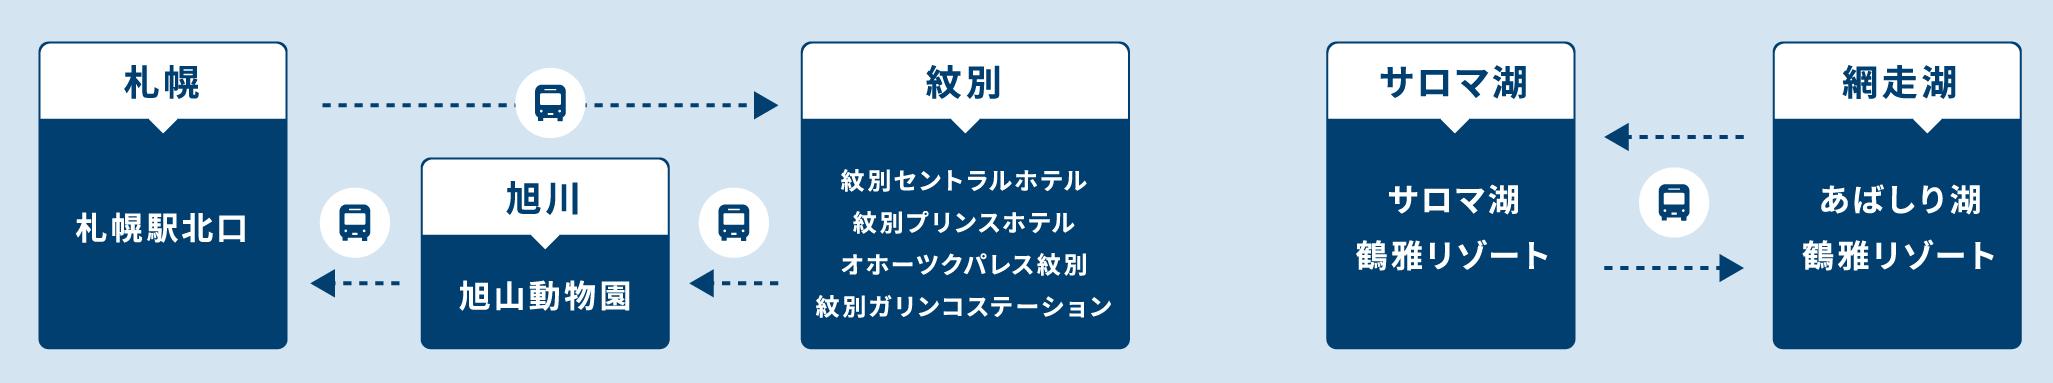 札幌紋別網走バス